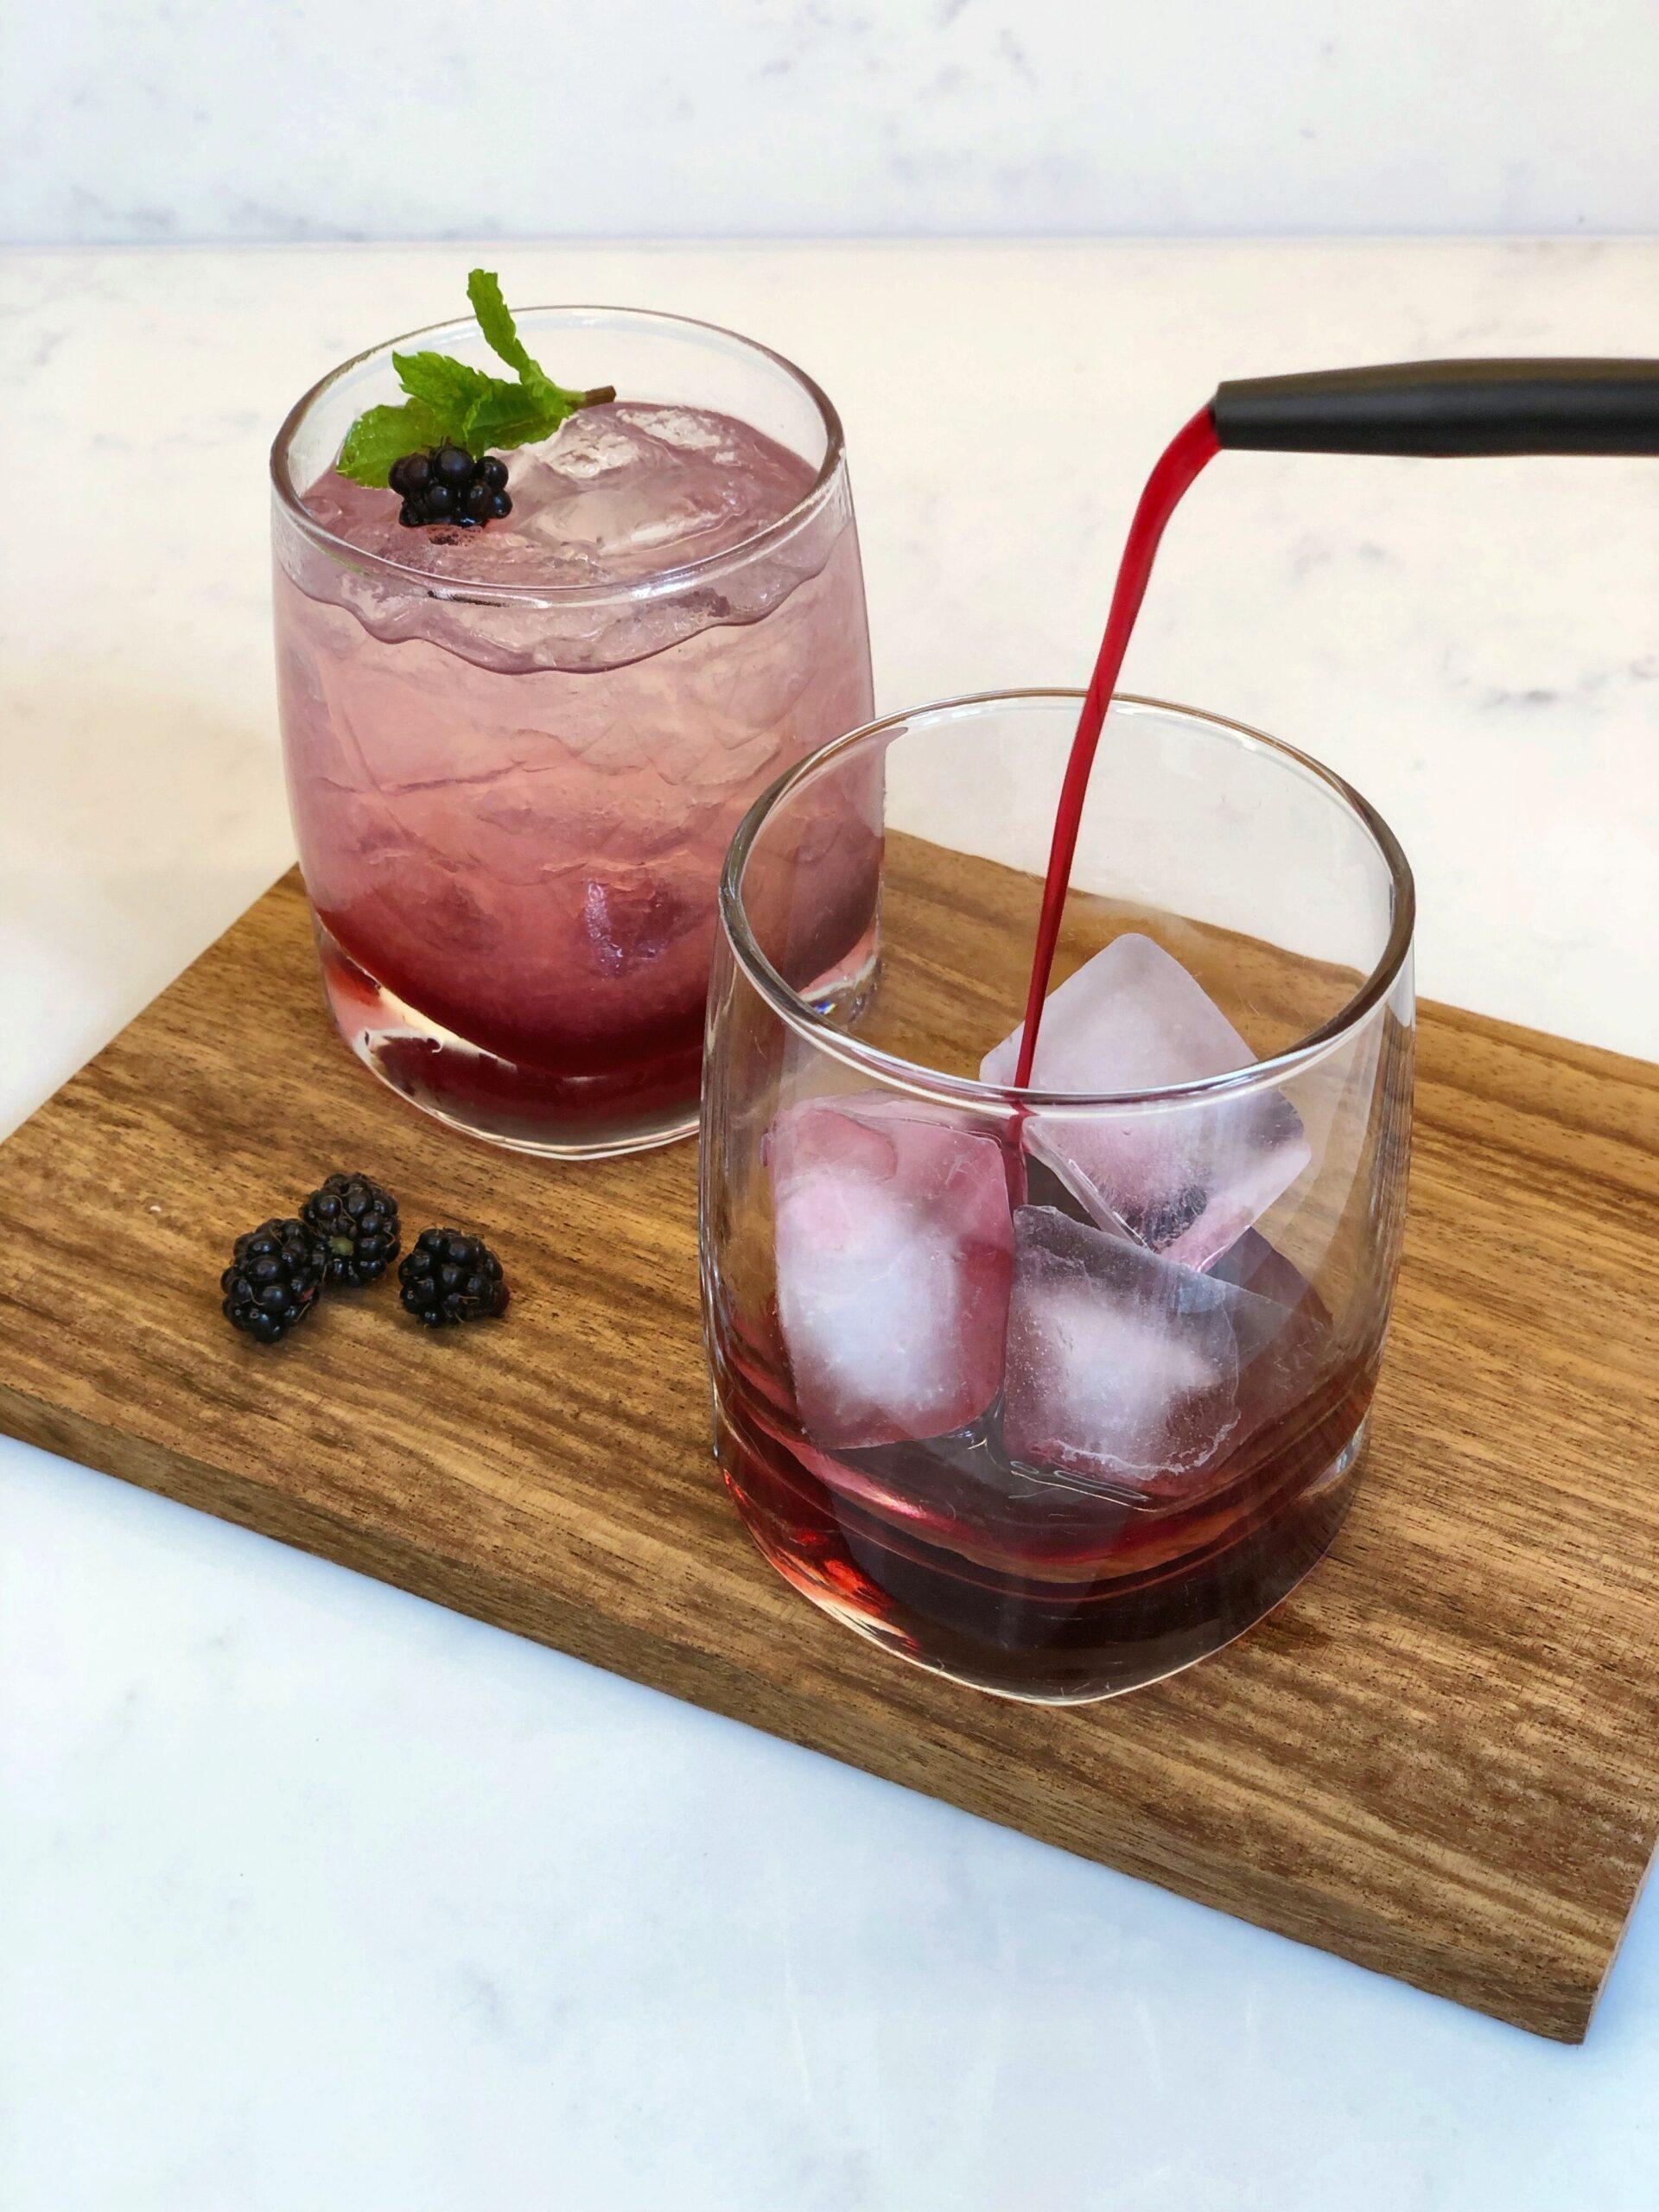 Homemade Creme De Mure Blackberry Liqueur